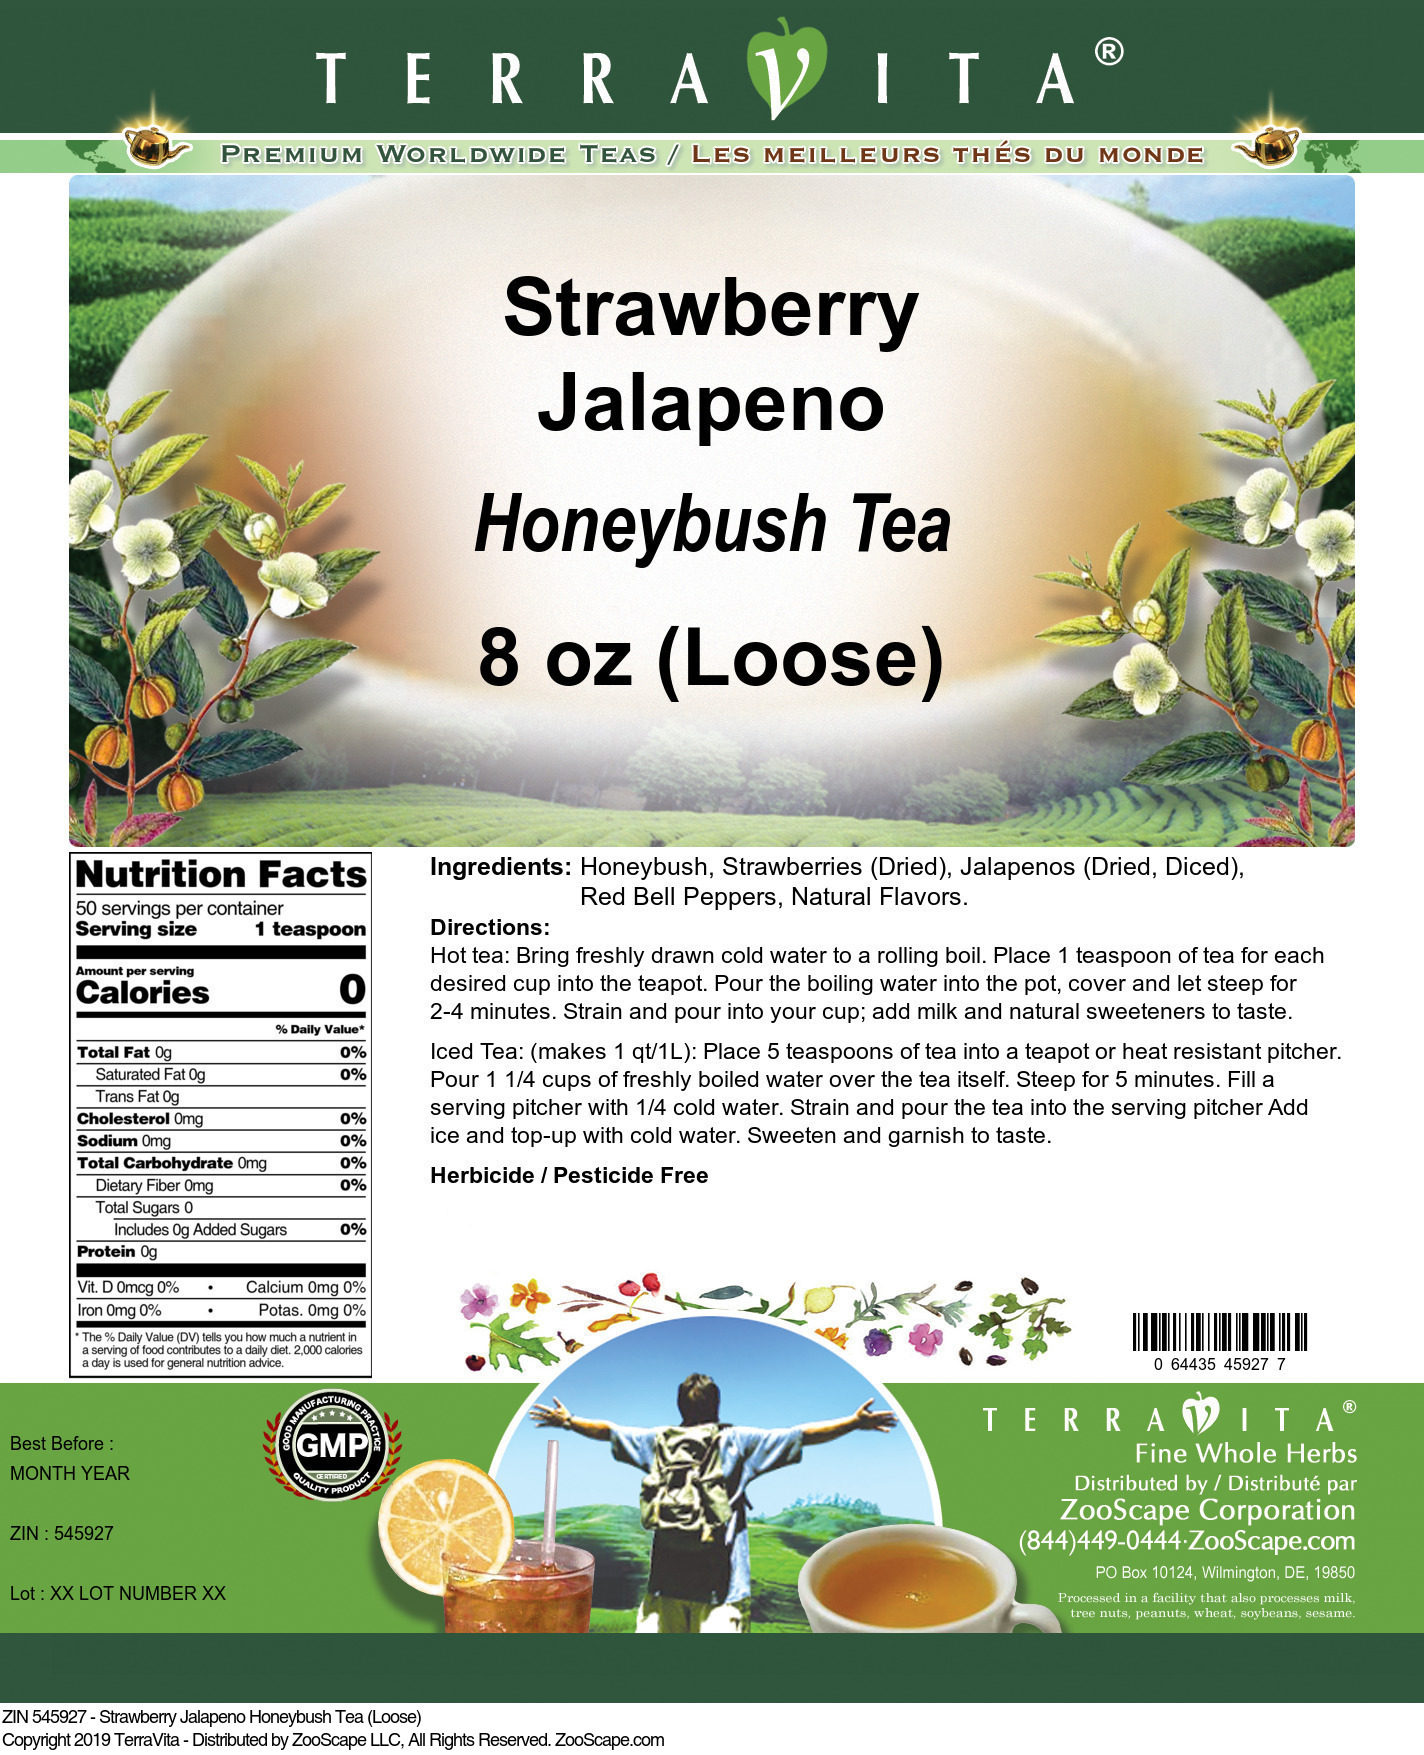 Strawberry Jalapeno Honeybush Tea (Loose)